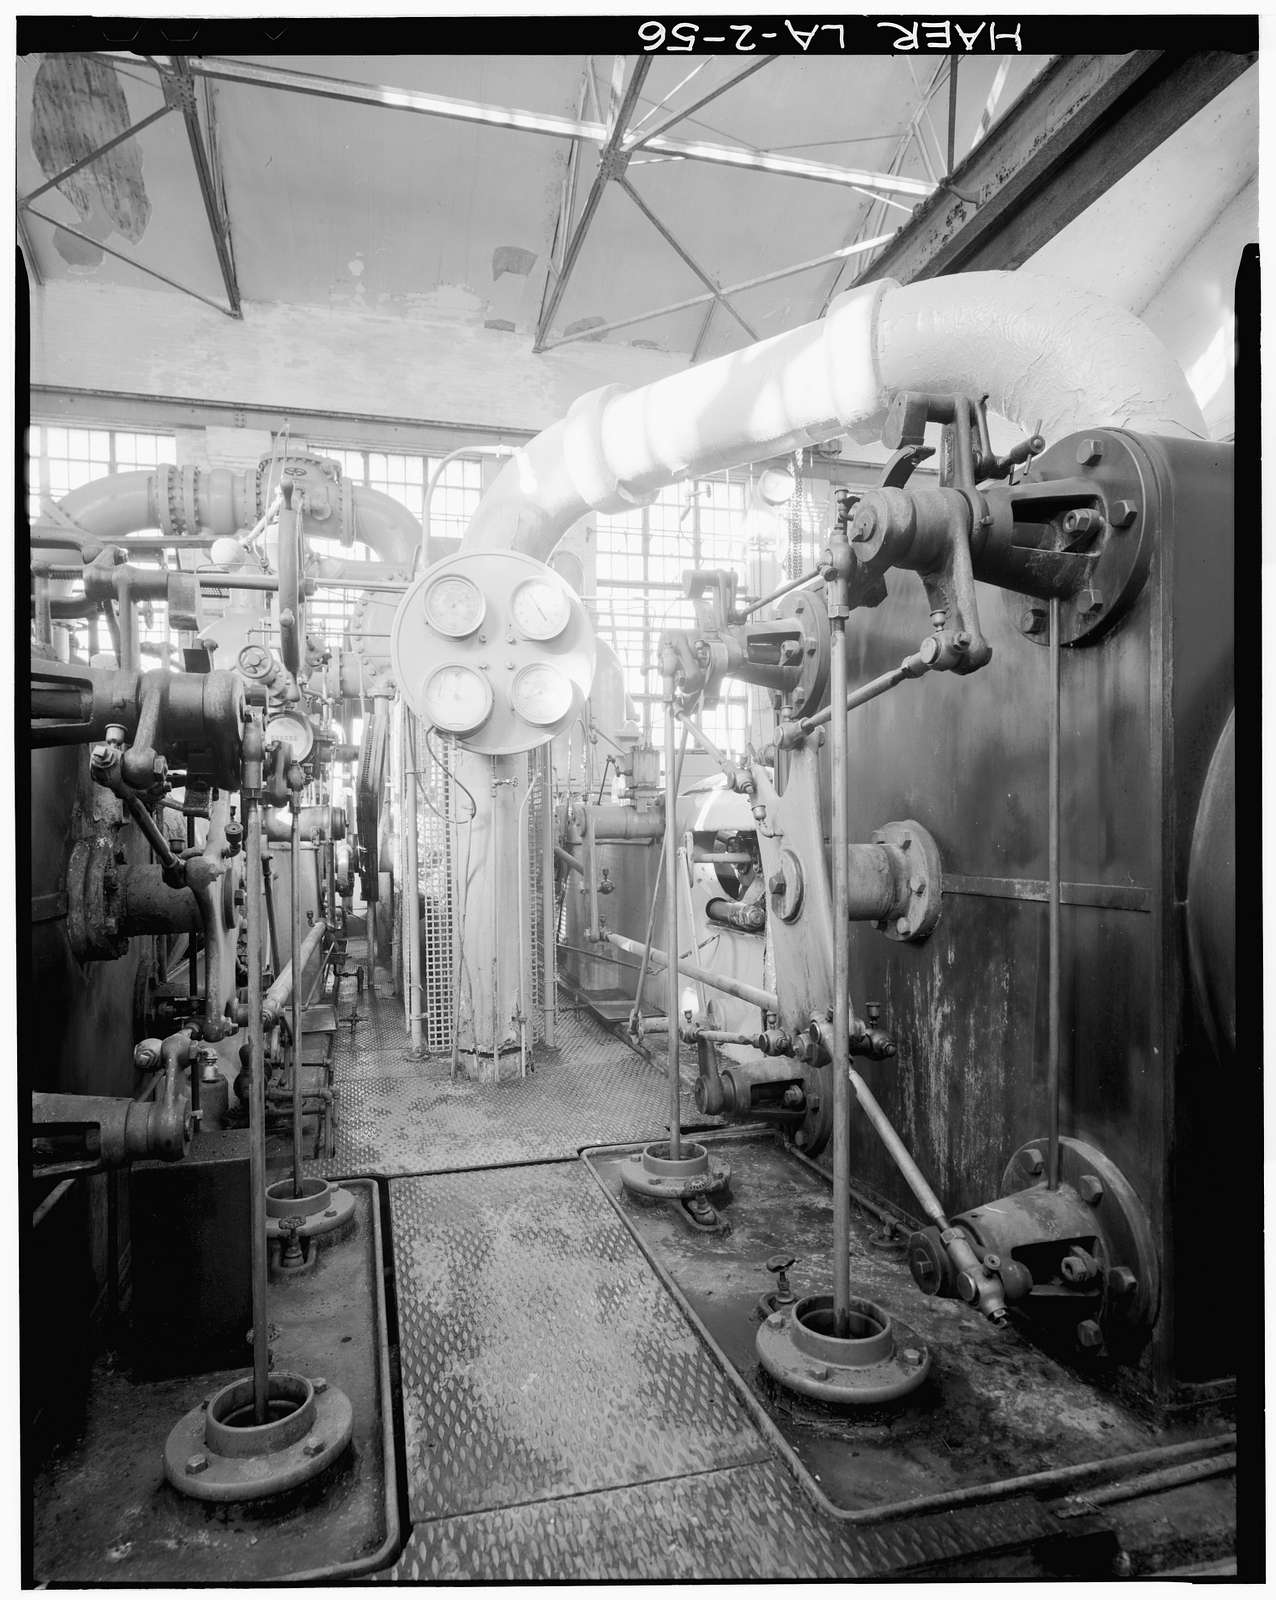 McNeil Street Pumping Station, McNeil Street & Cross Bayou, Shreveport, Caddo Parish, LA